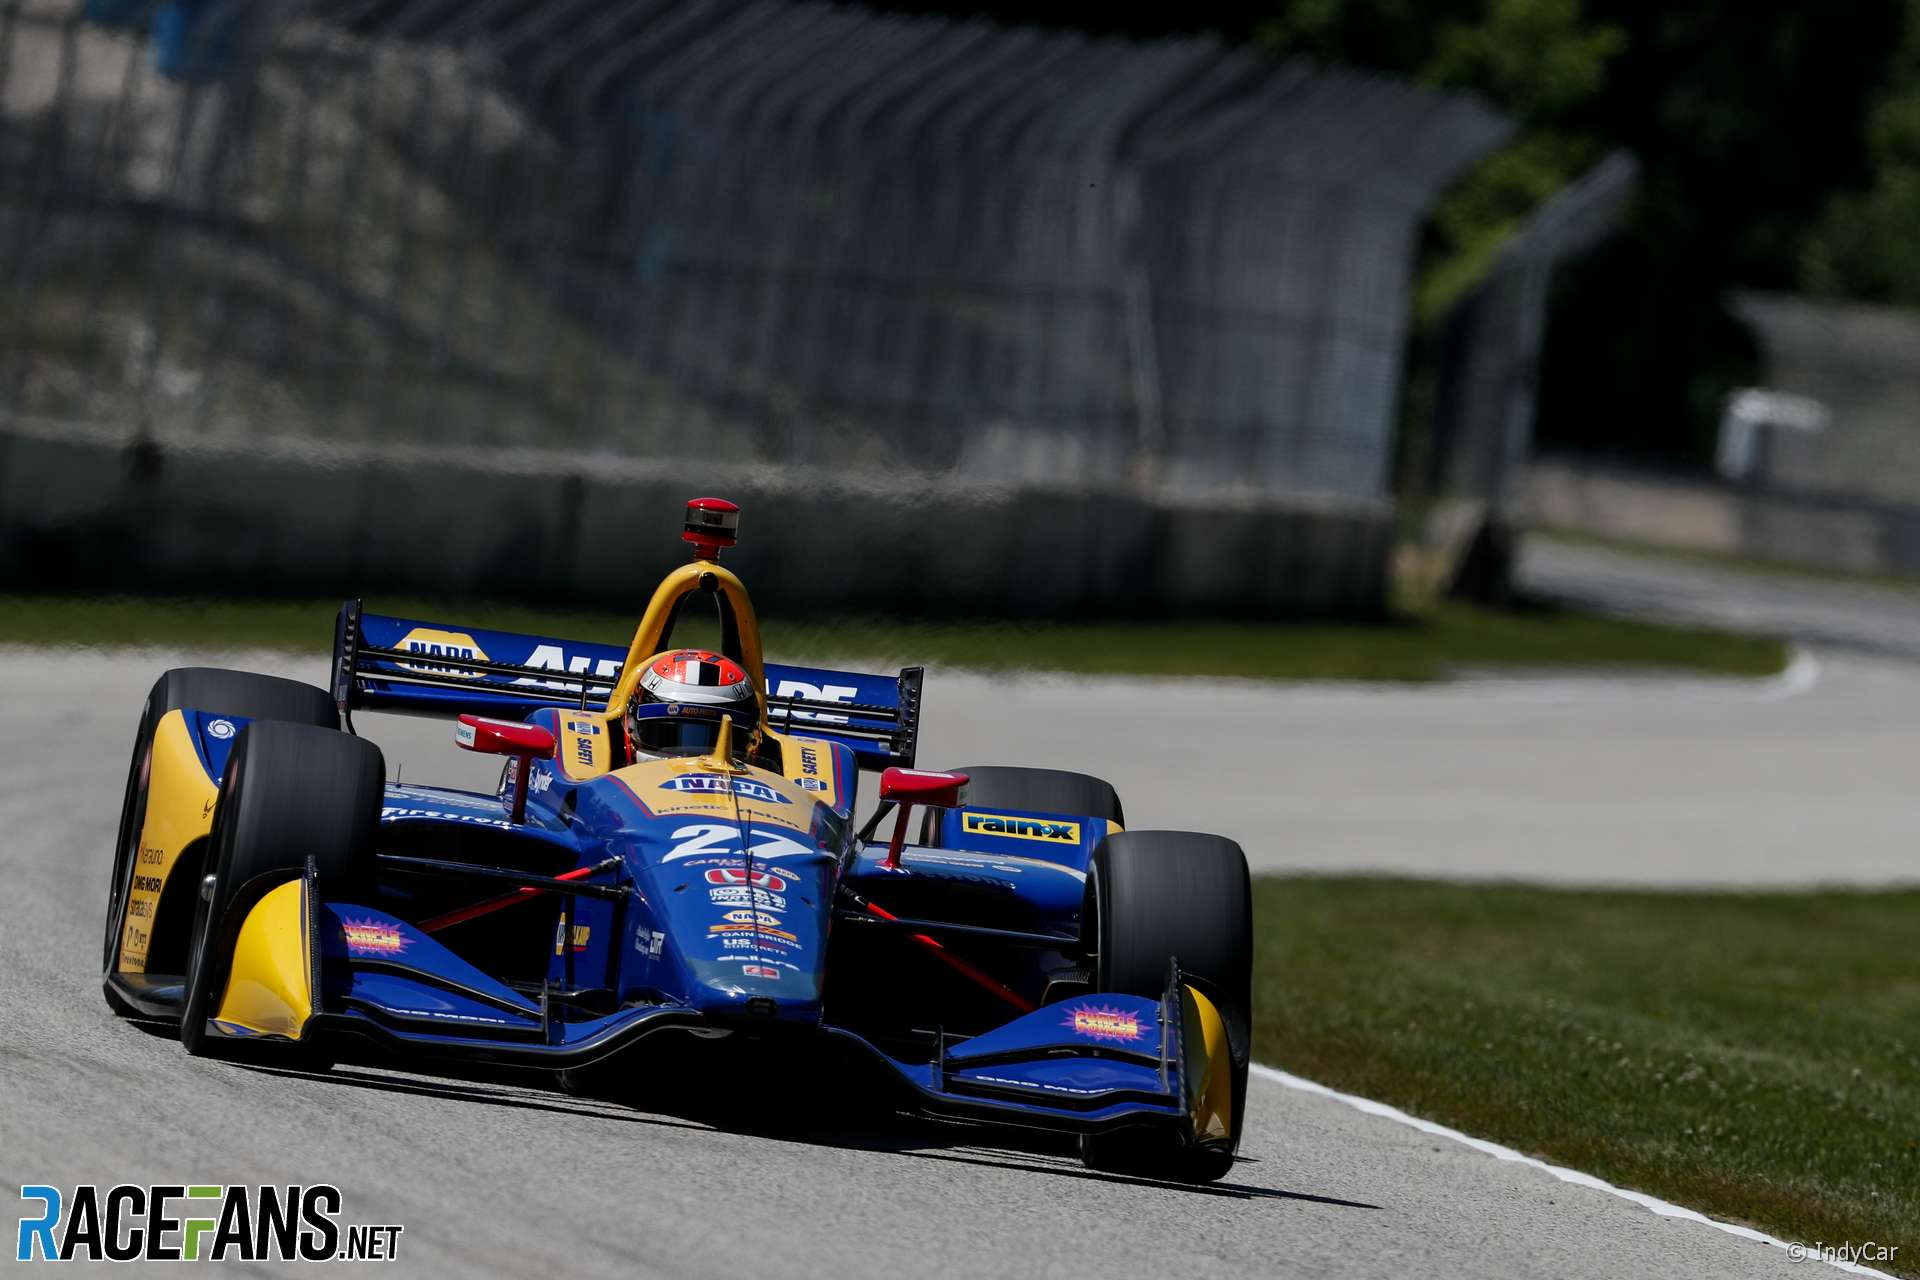 Alexander Rossi, IndyCar, Road America, 2019